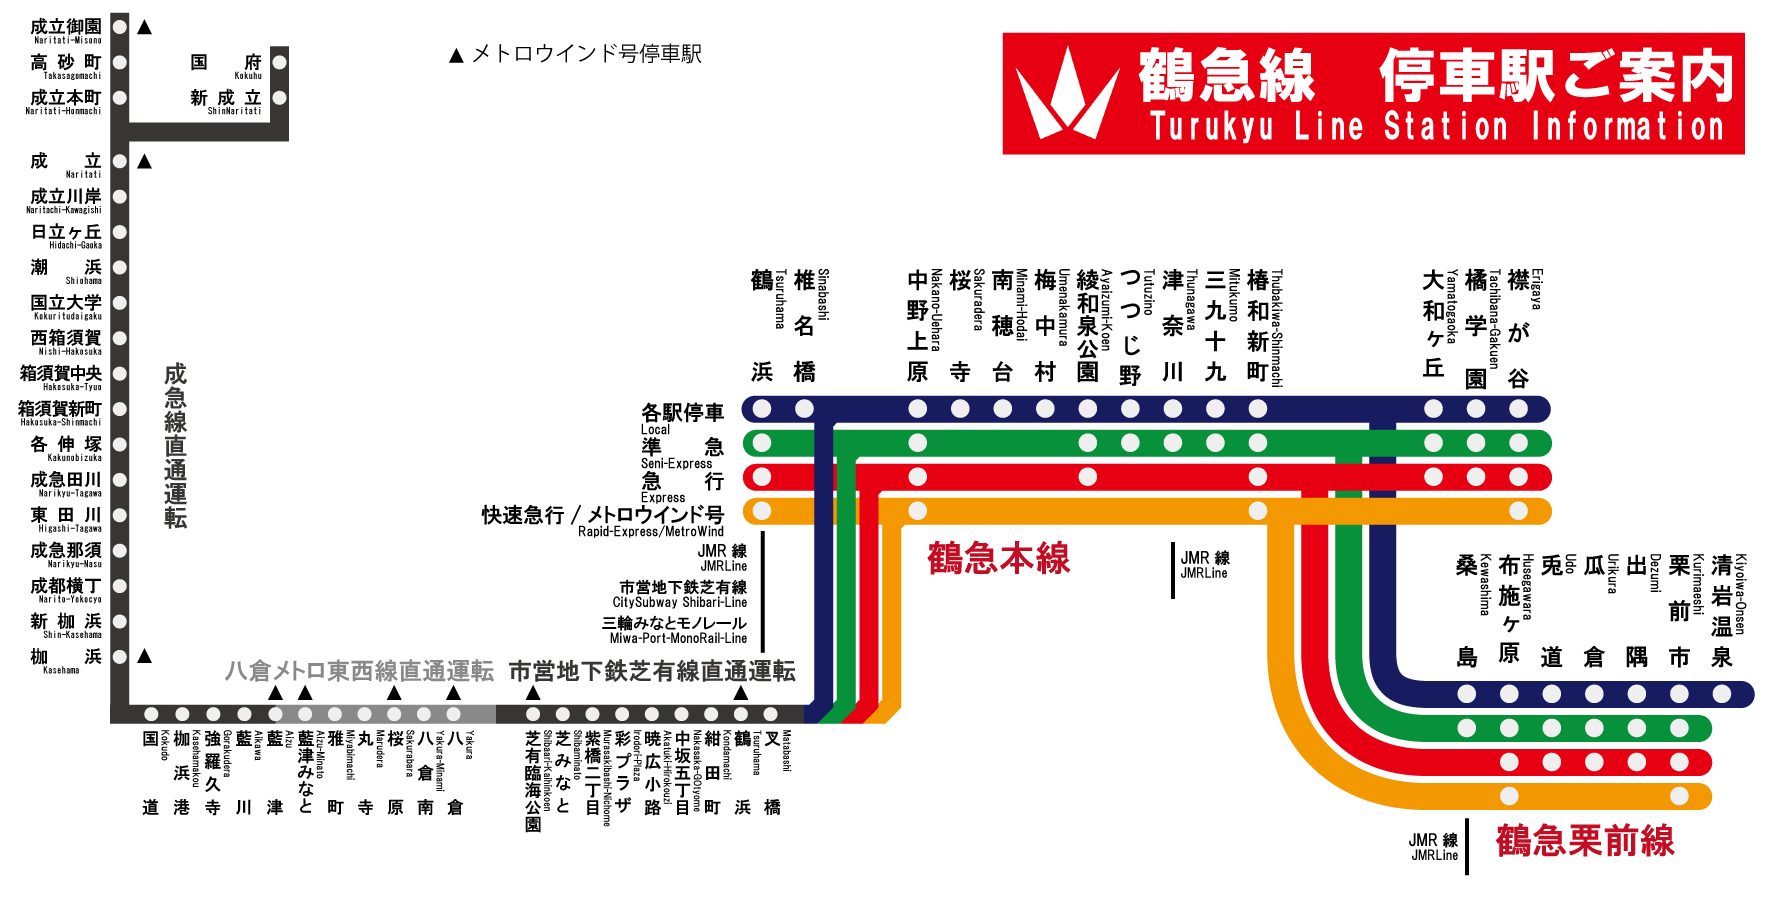 路線図21.png